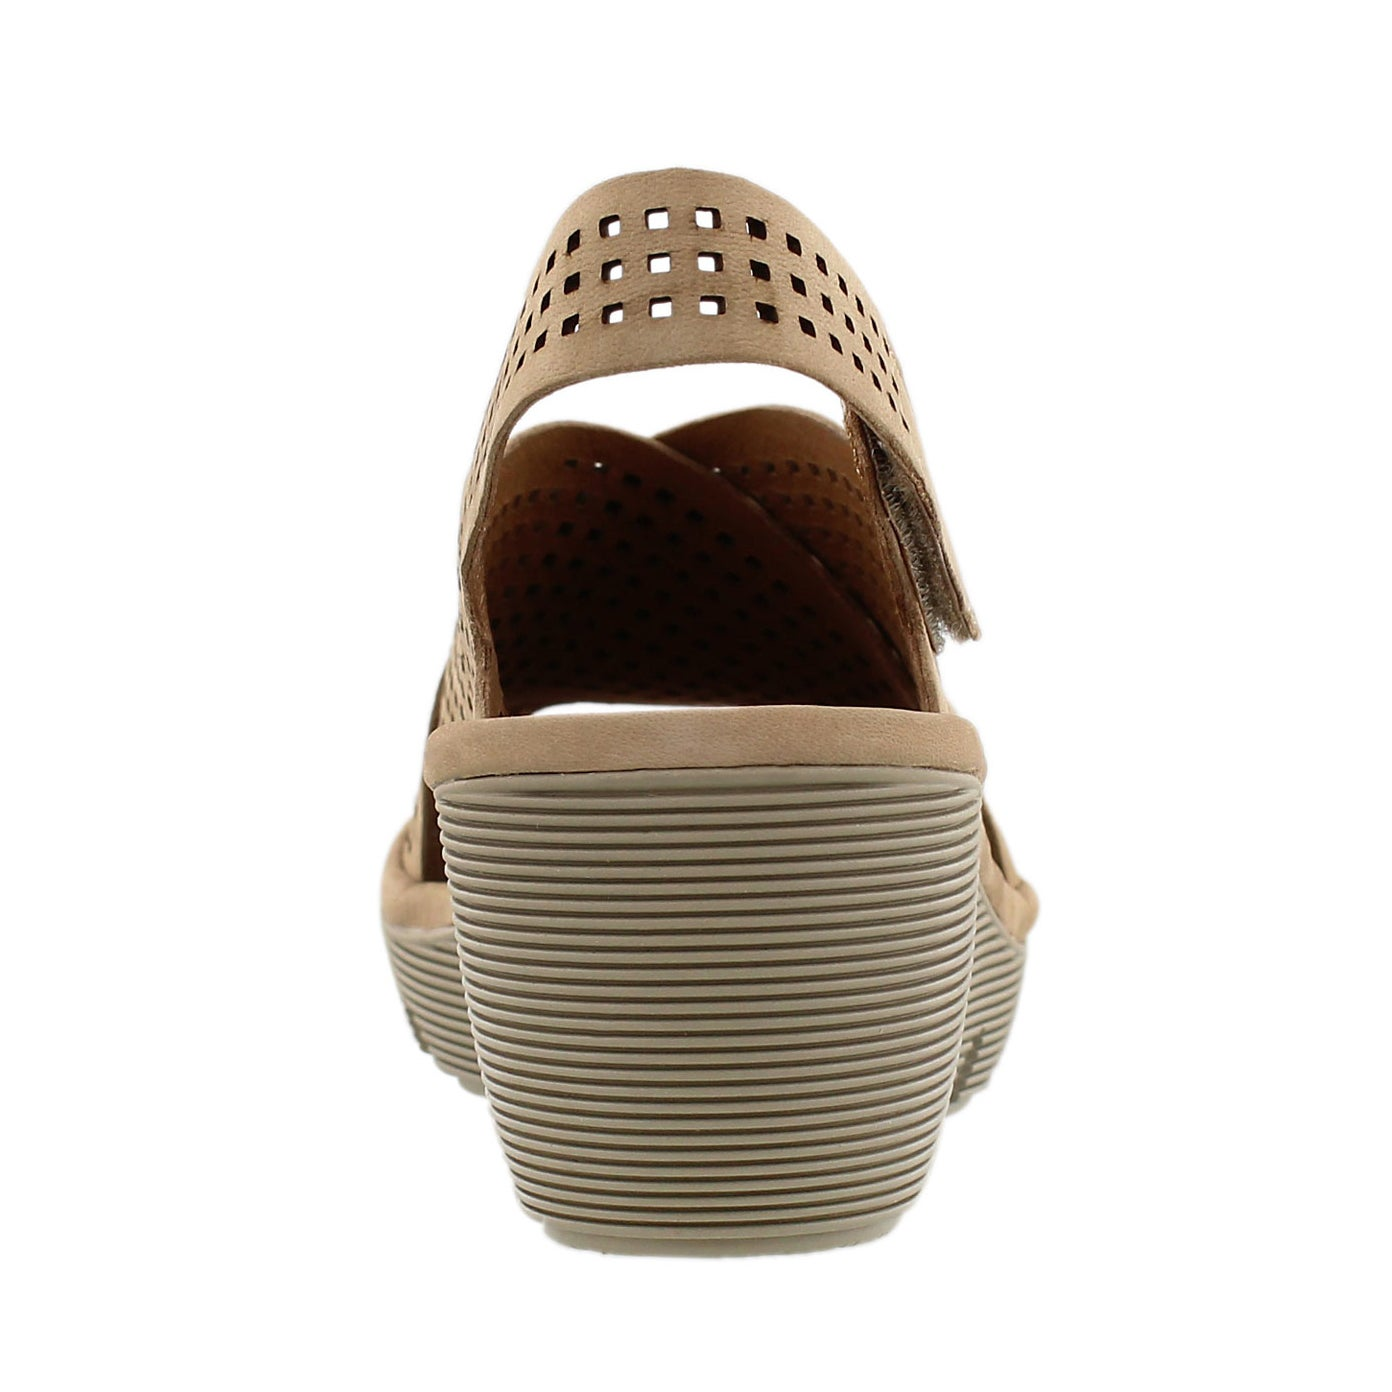 Lds Clarene Award sand wedge sandal